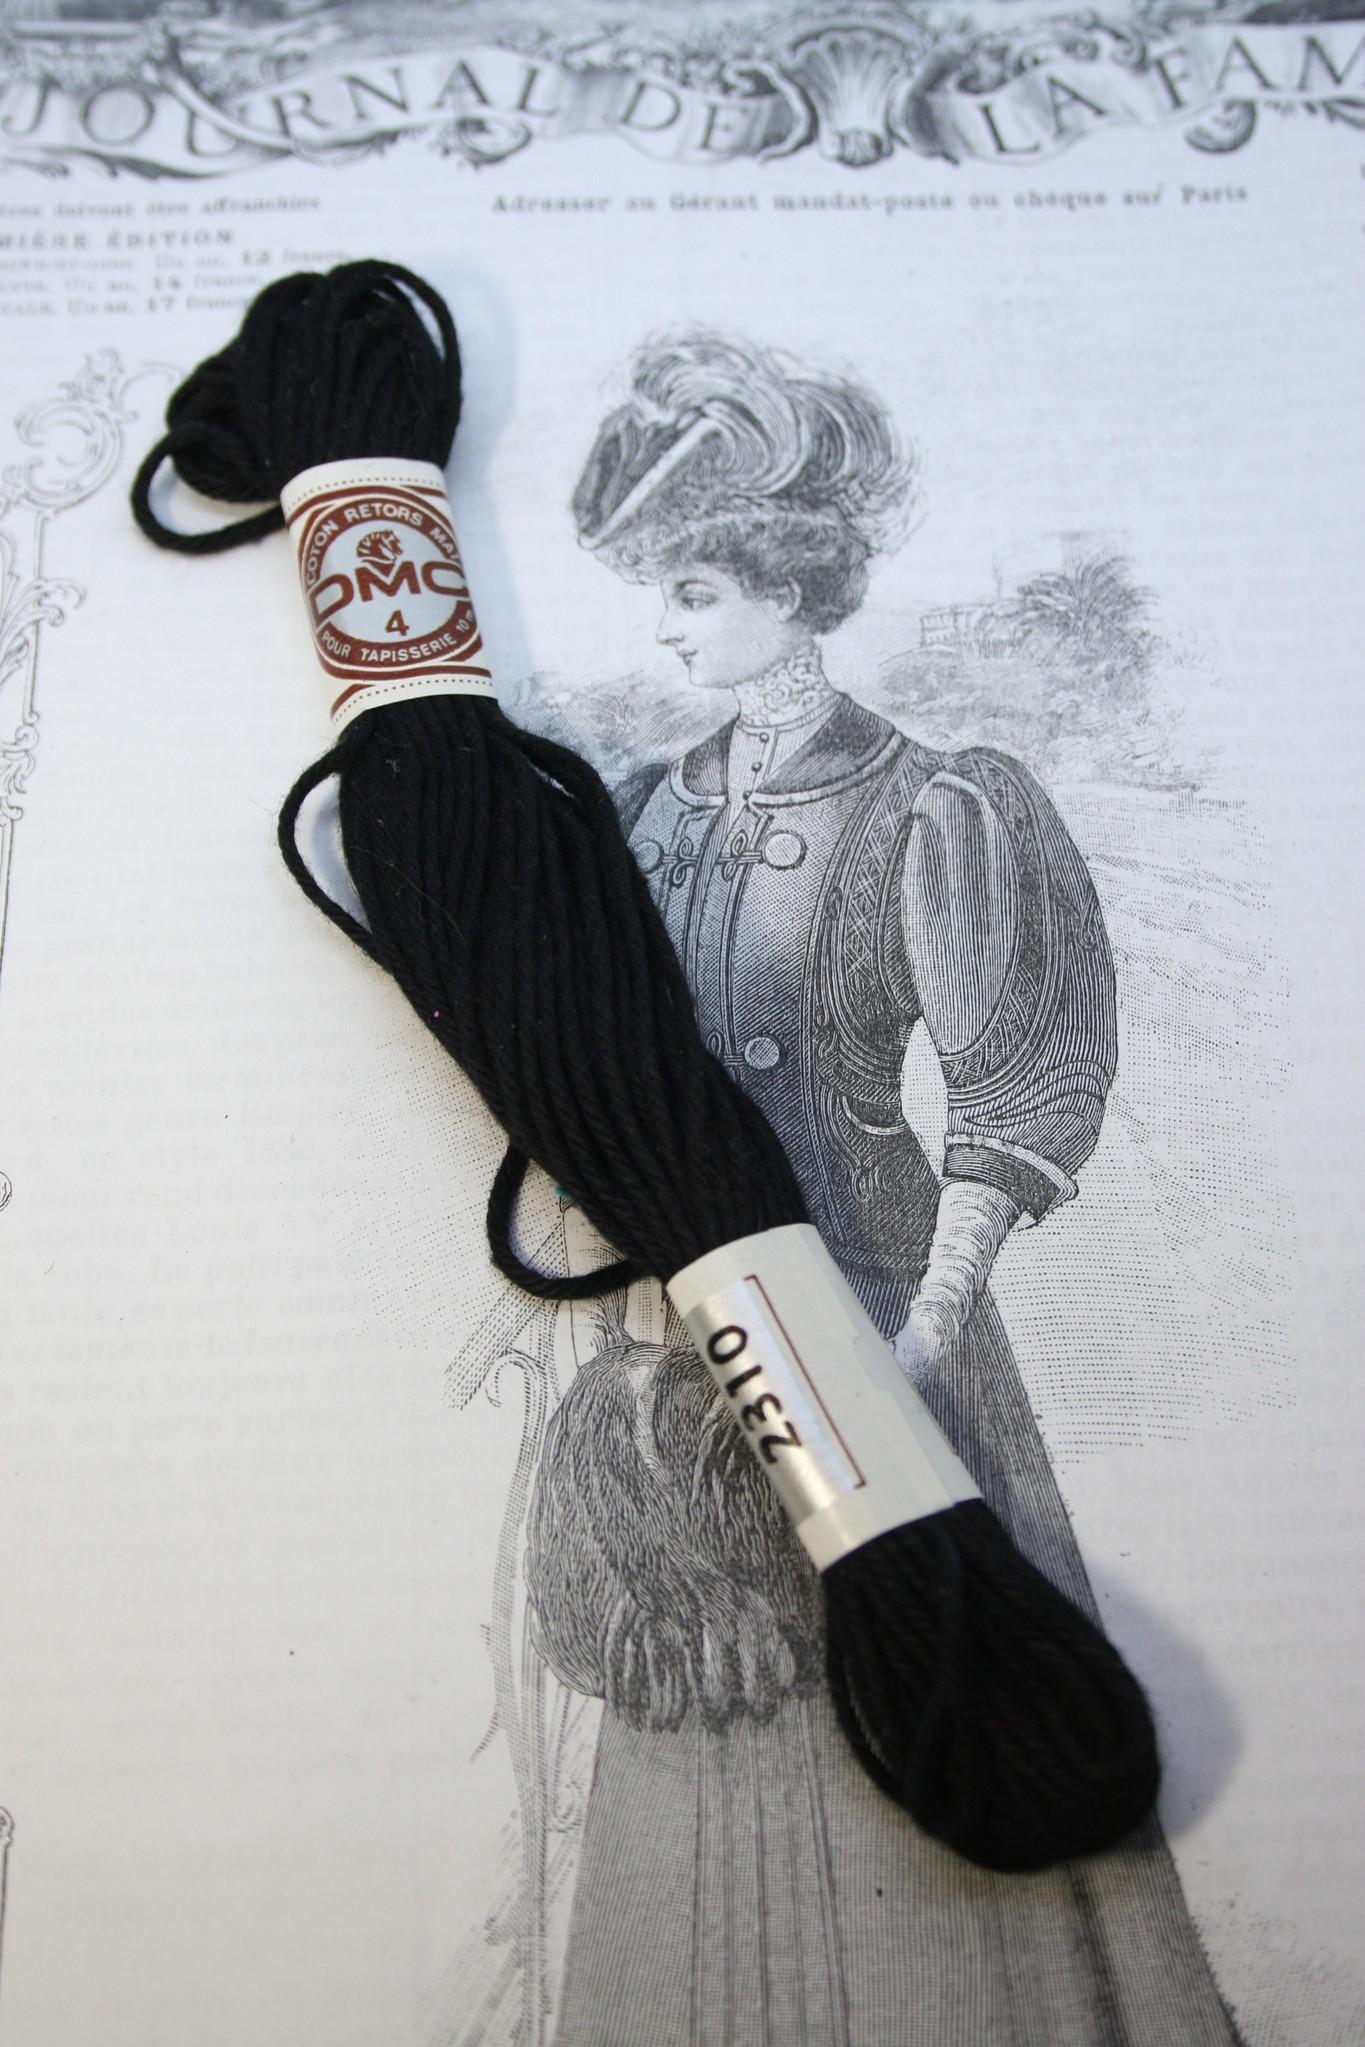 DMC Tapestry embroidery thread black.